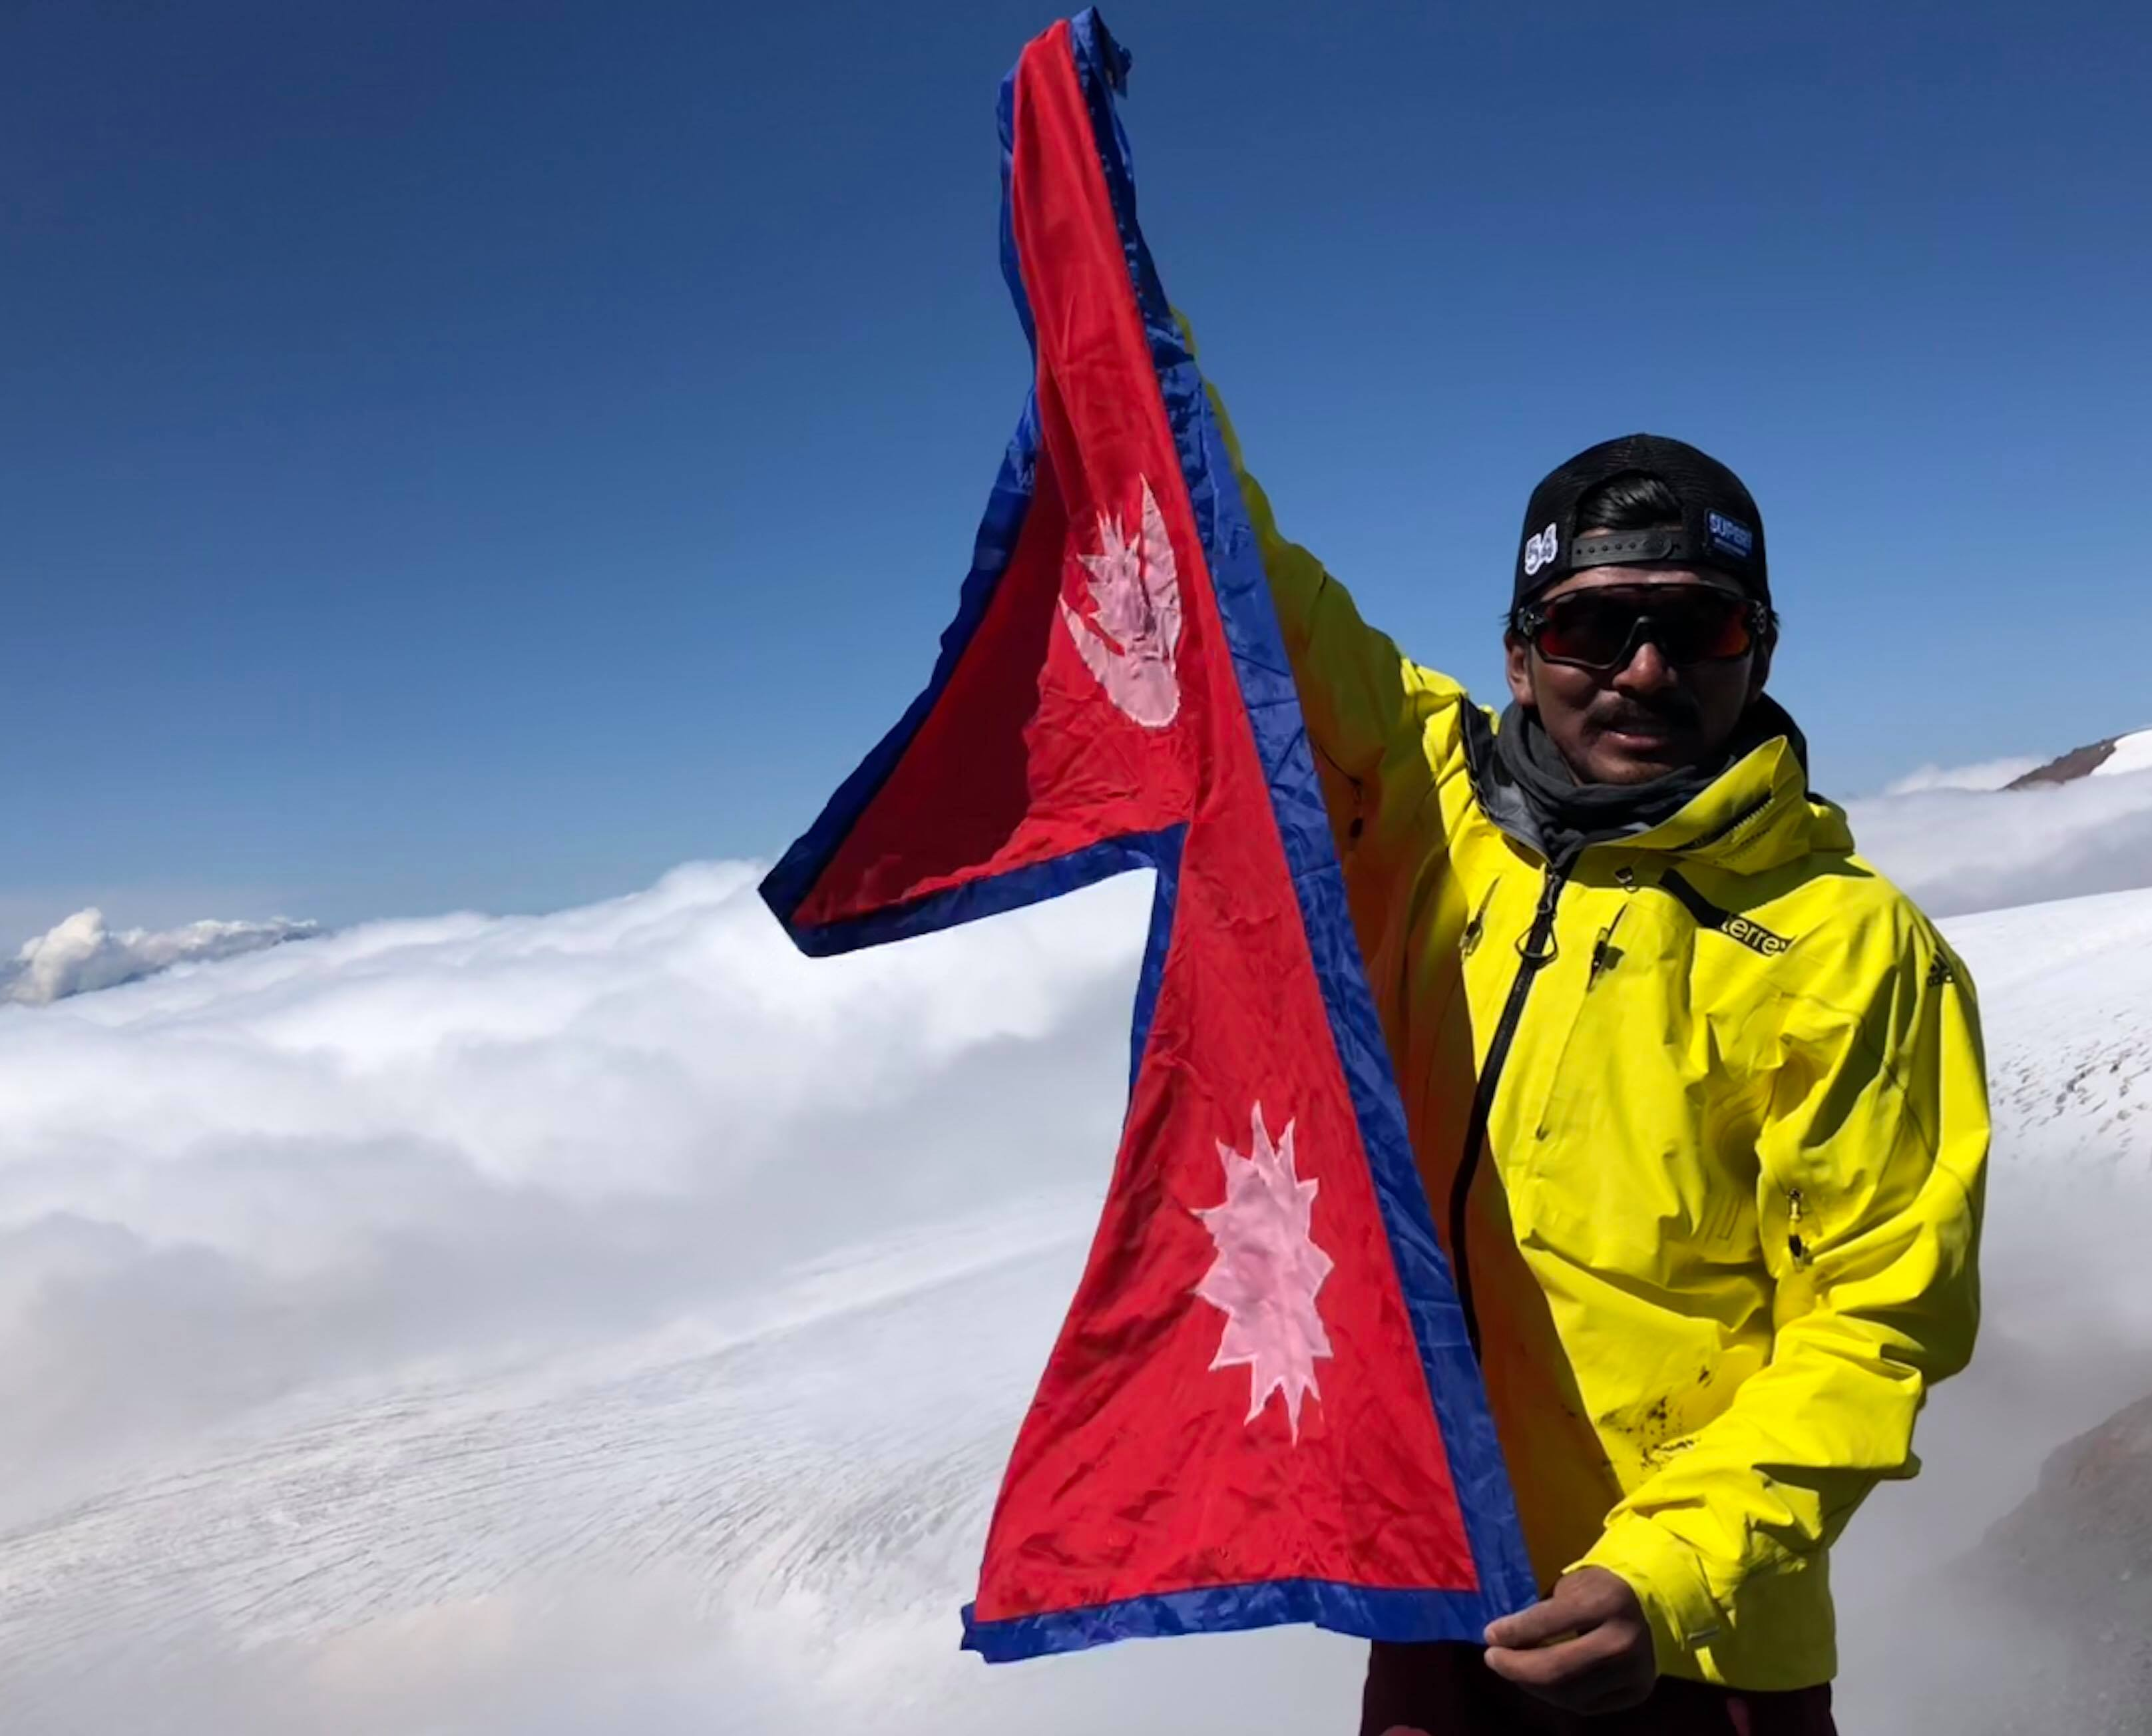 Mingma David Sherpa poses for a photo atop Mt Elbrus, the highest mountain in Europe. Photo:Mingma David Sherpa